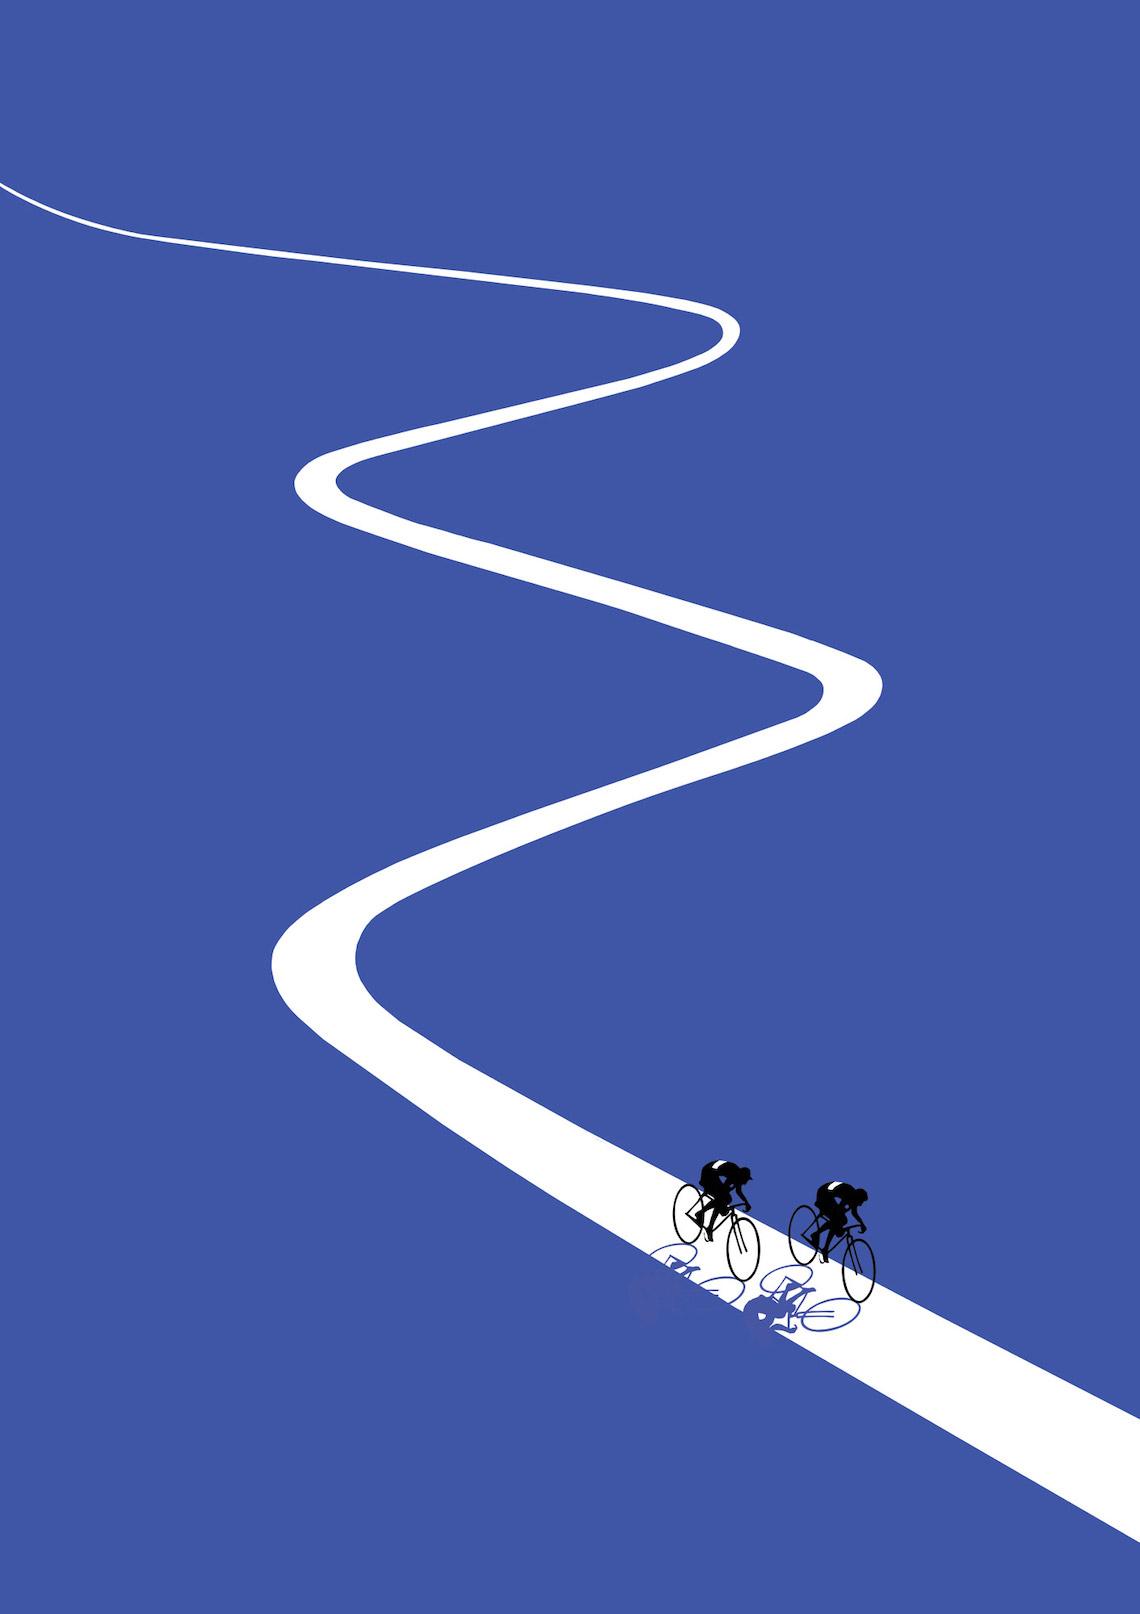 Jason Brooks ciilustrazioni sul ciclismo_1